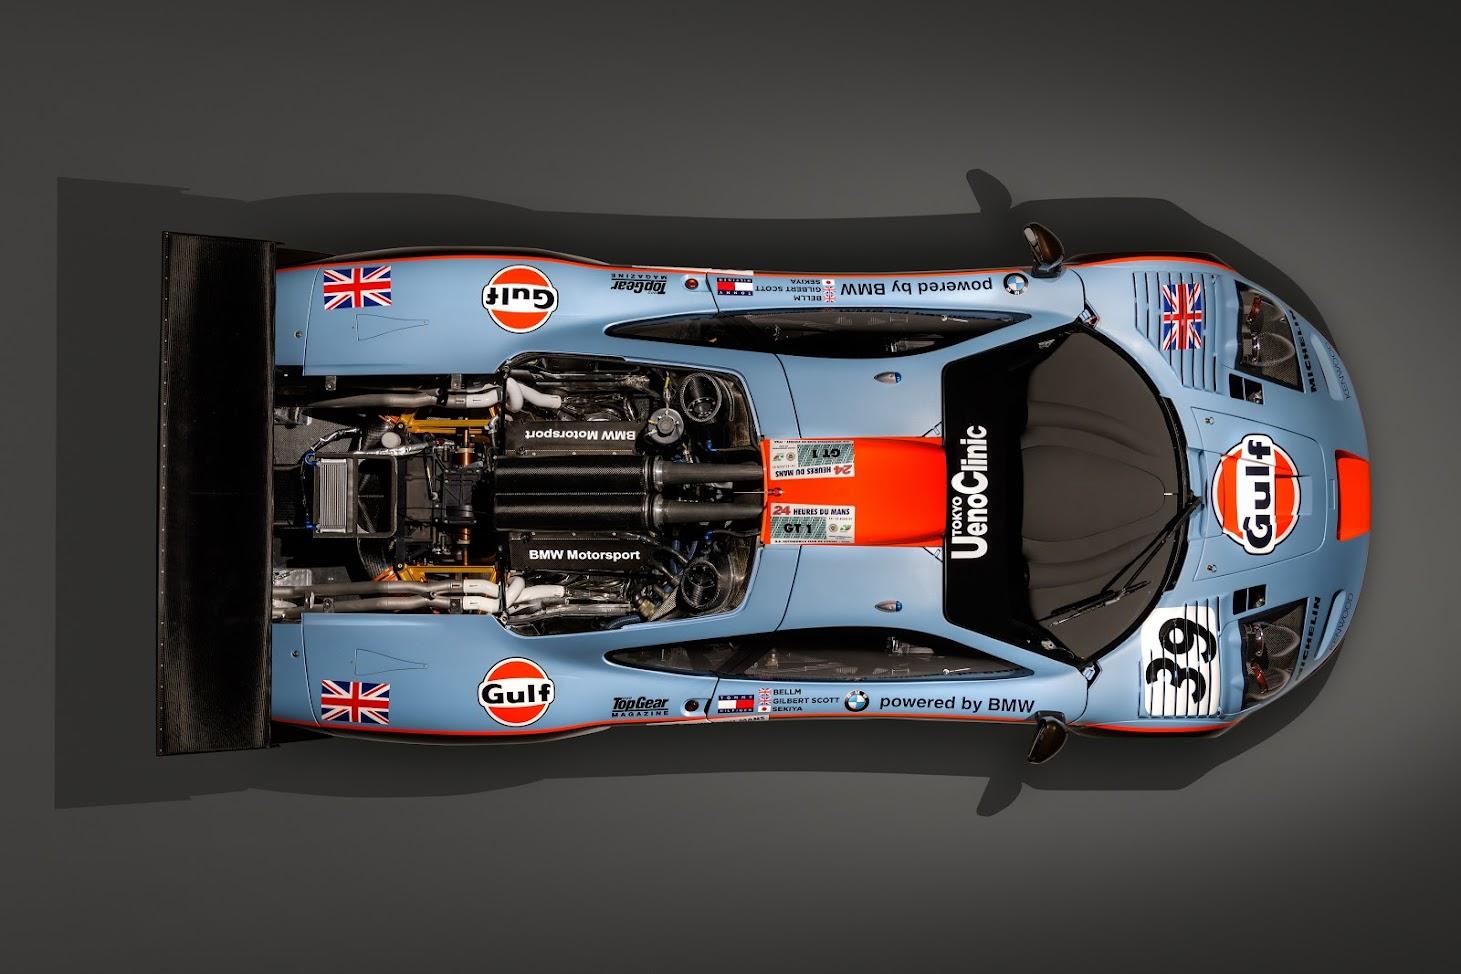 McLaren F1 GTR Longtail 025R